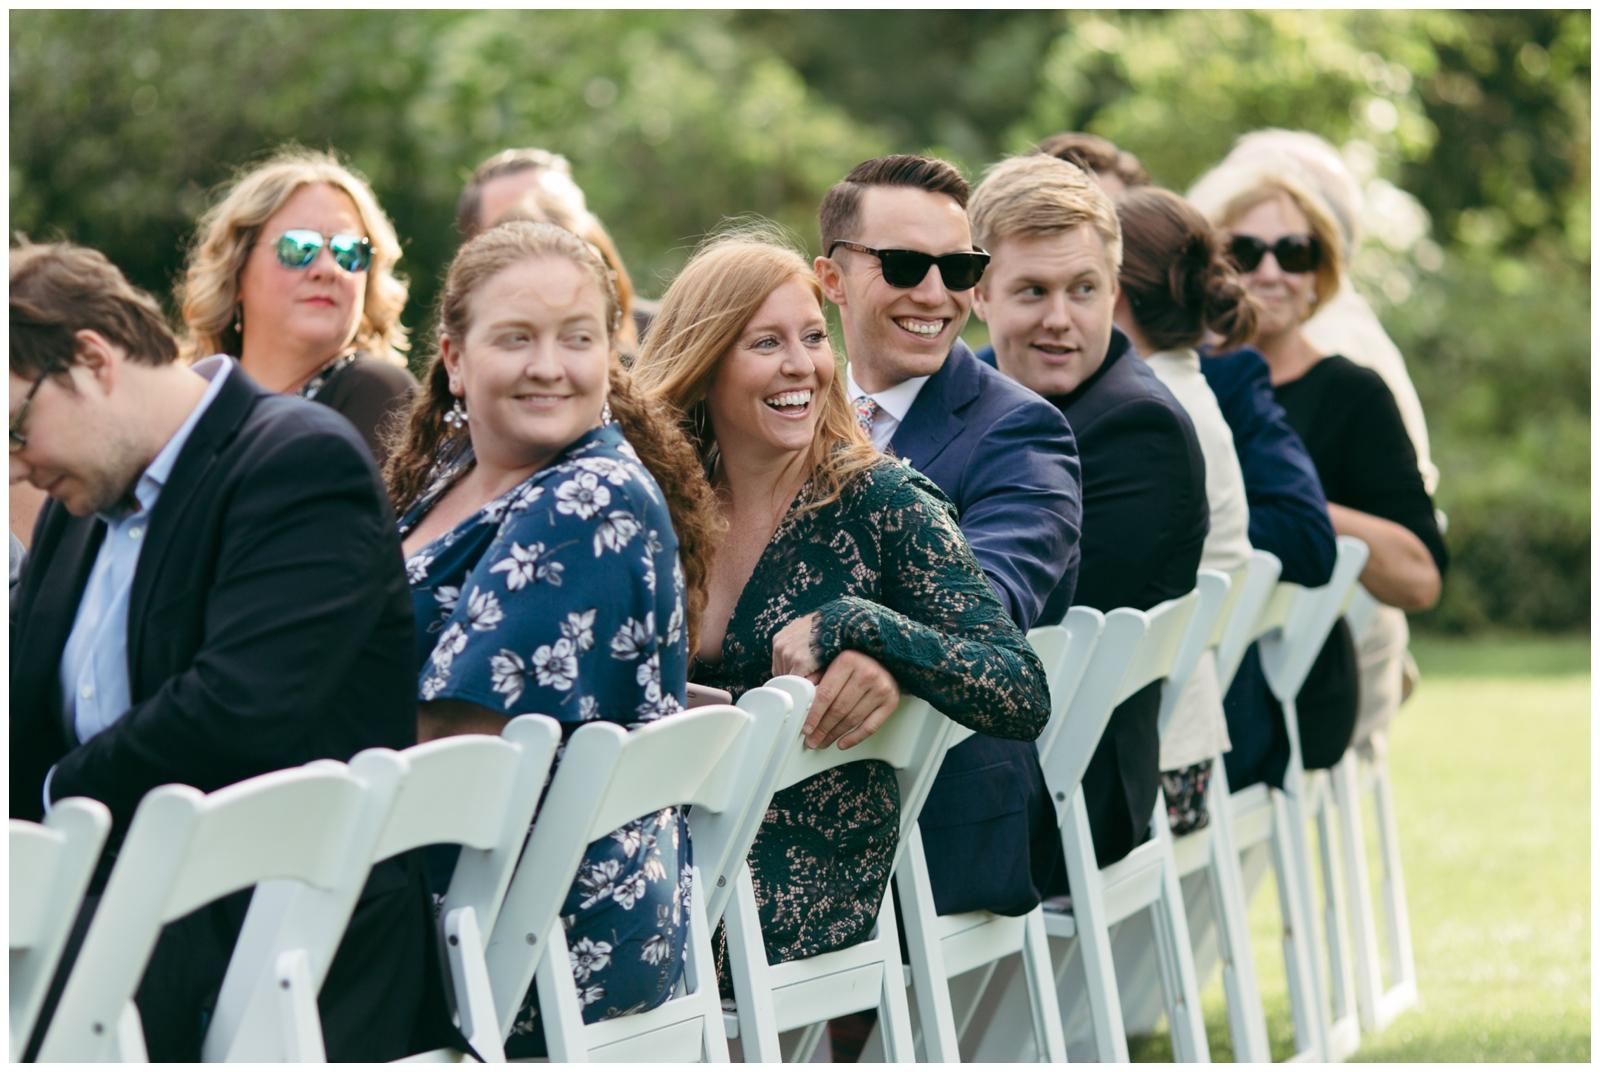 Moraine-Farm-wedding-Bailey-Q-Photo-Massachusetts-wedding-photpgrapher-055.jpg